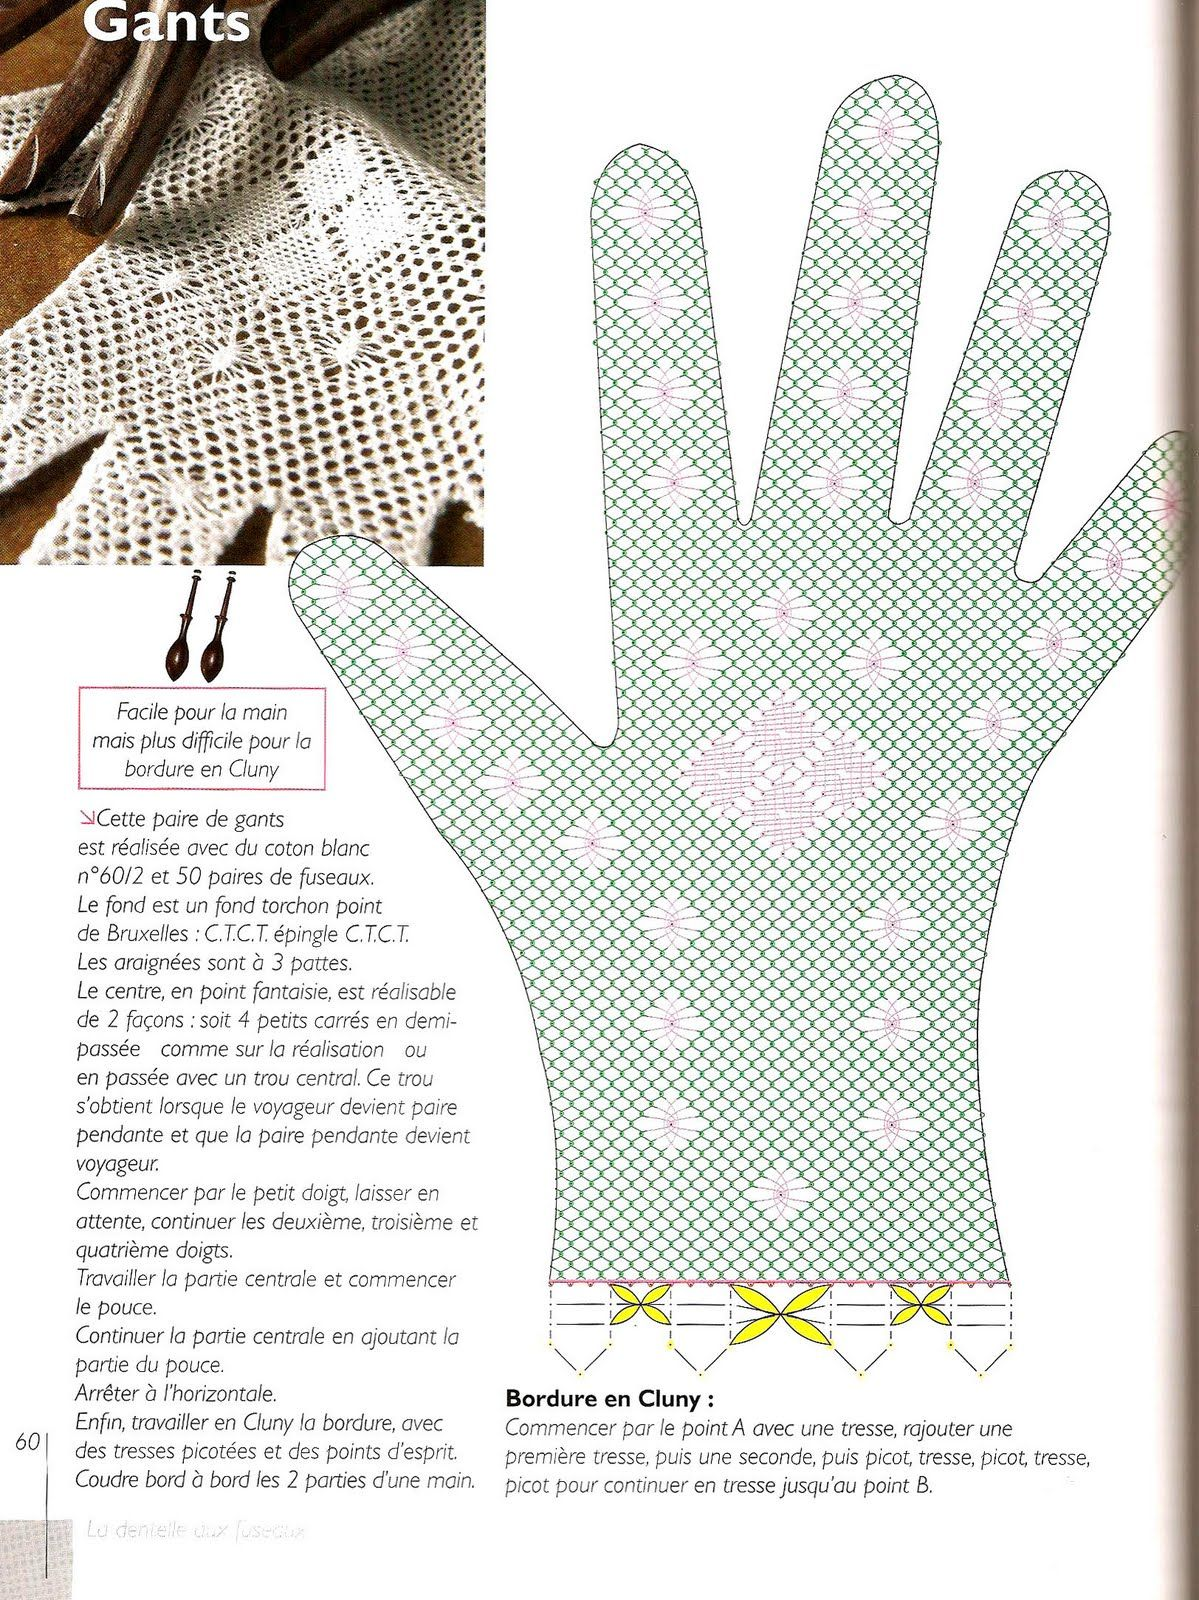 060.jpg (1199×1600) | pirkstaiņi | Pinterest | Guantes, Tejido y Telar